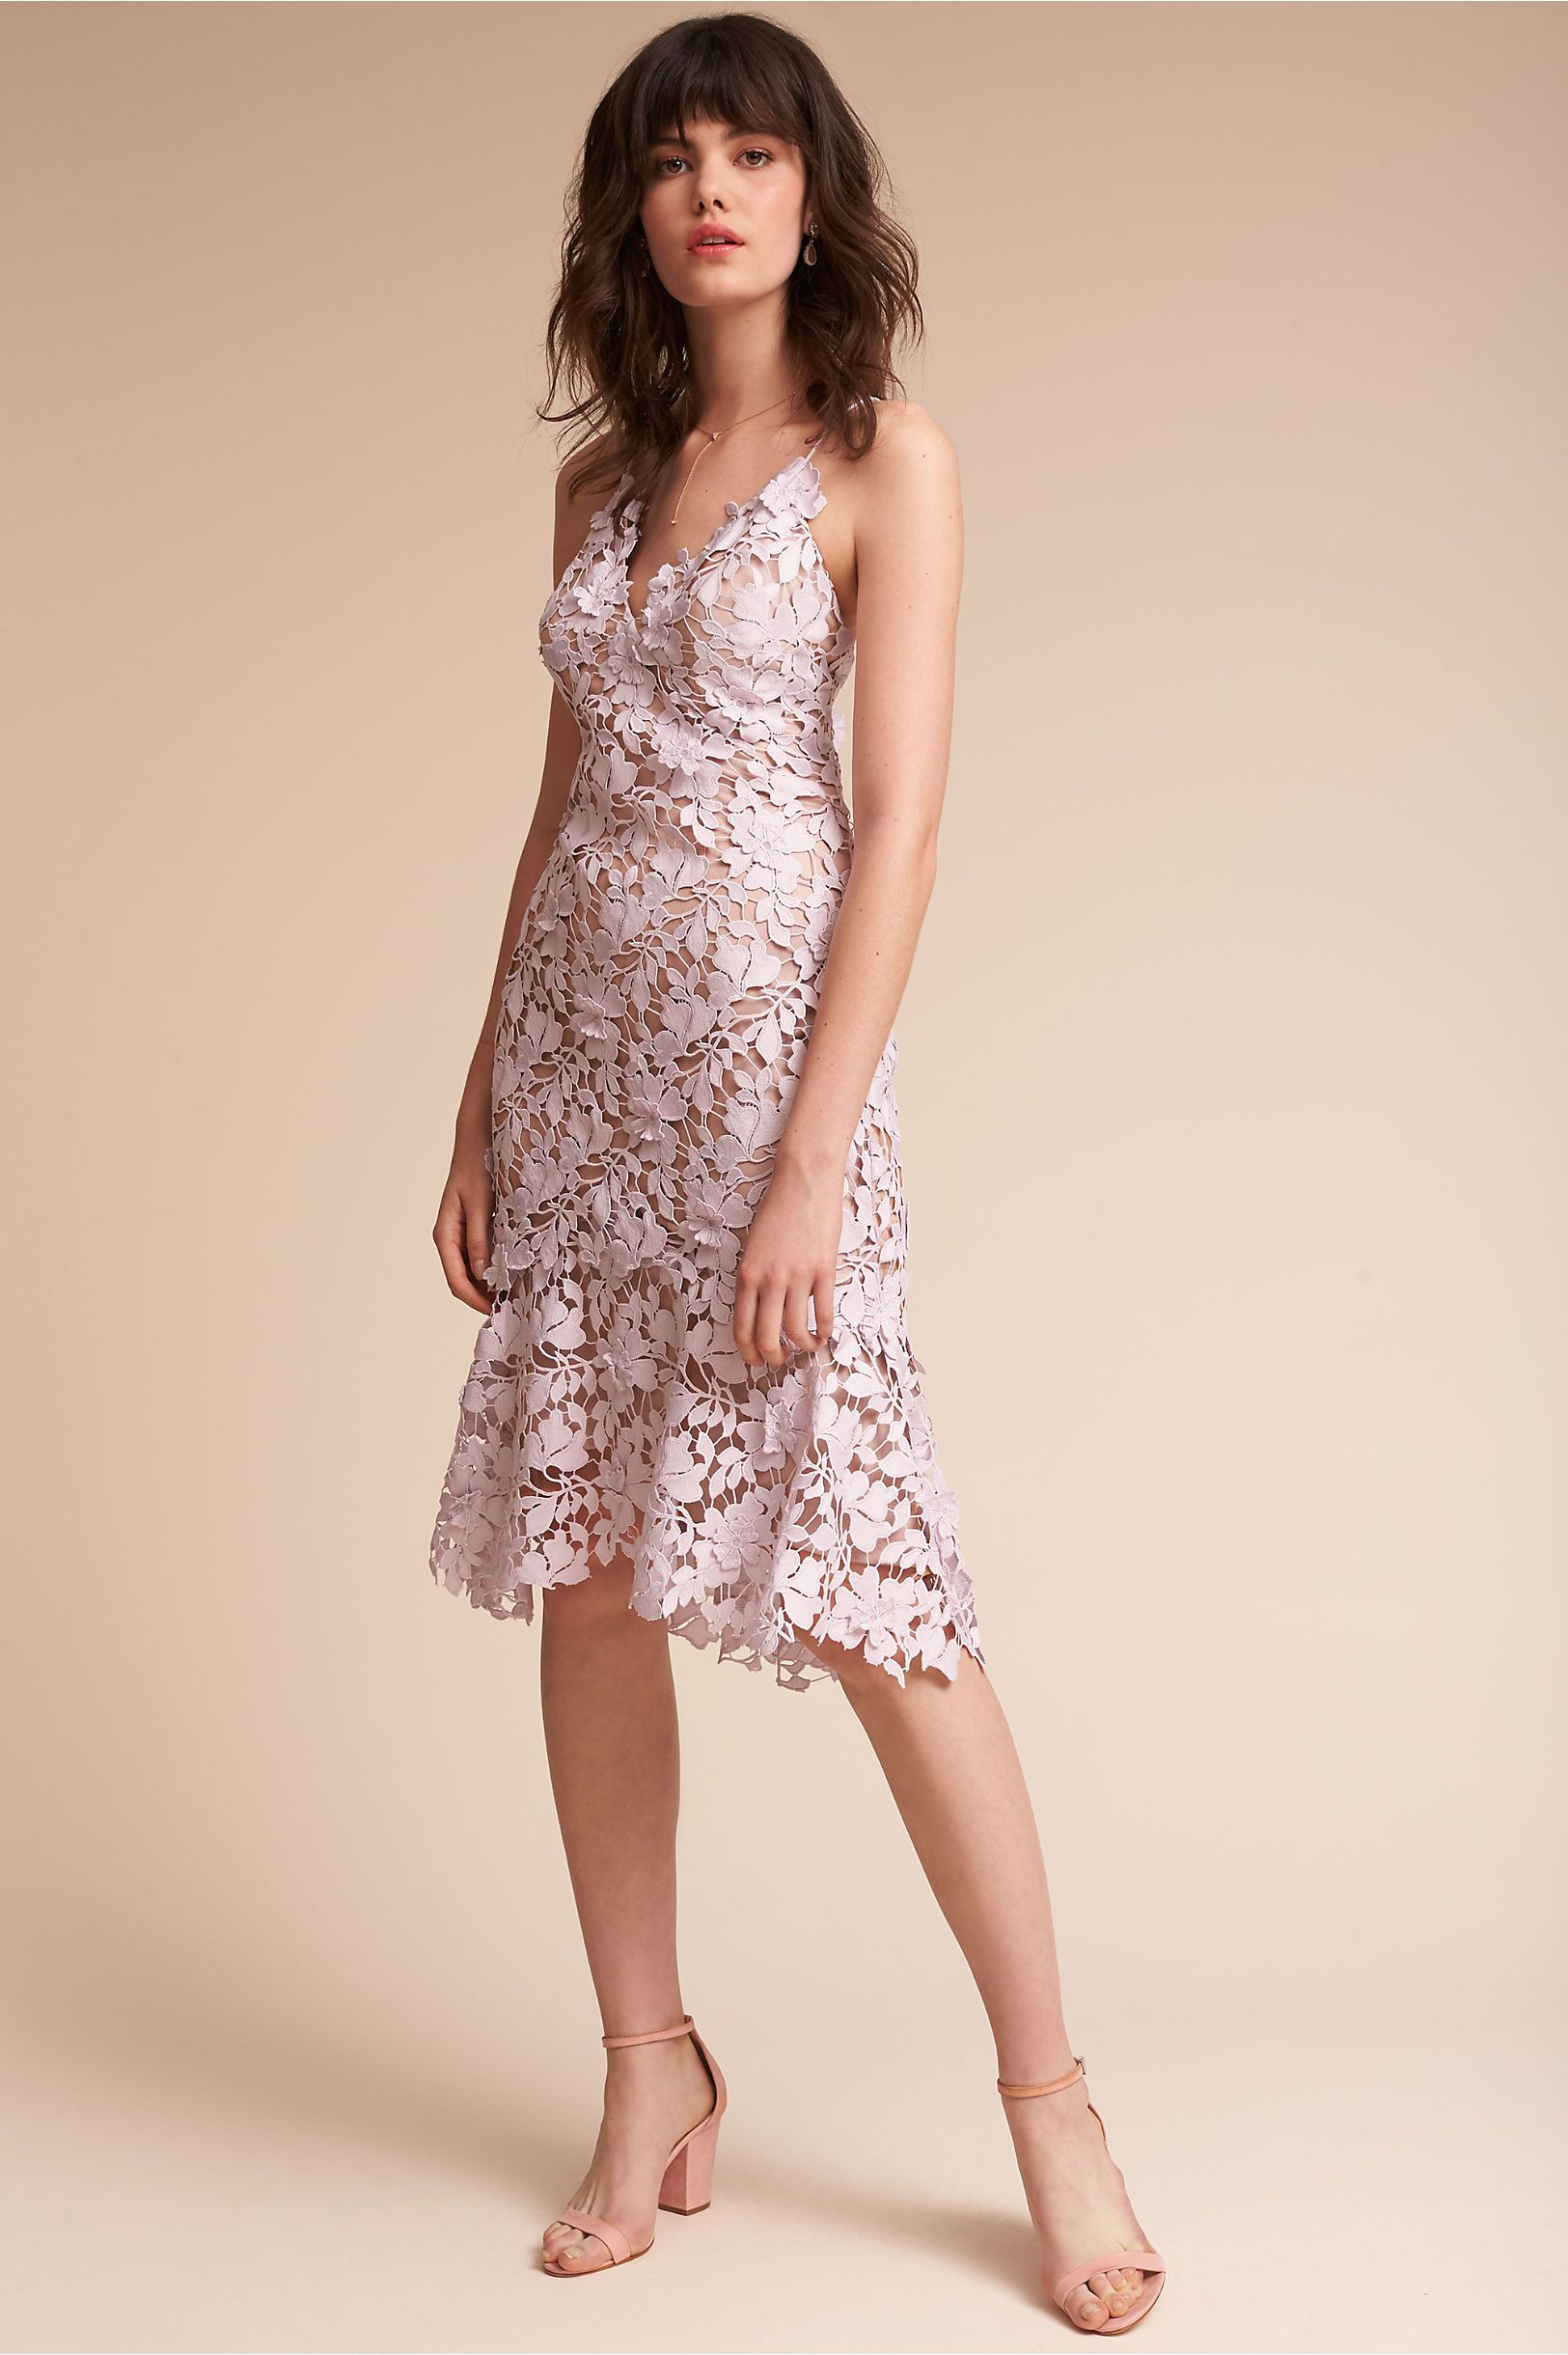 c00248cf091 BHLDN Marina Dress in Occasion Dresses